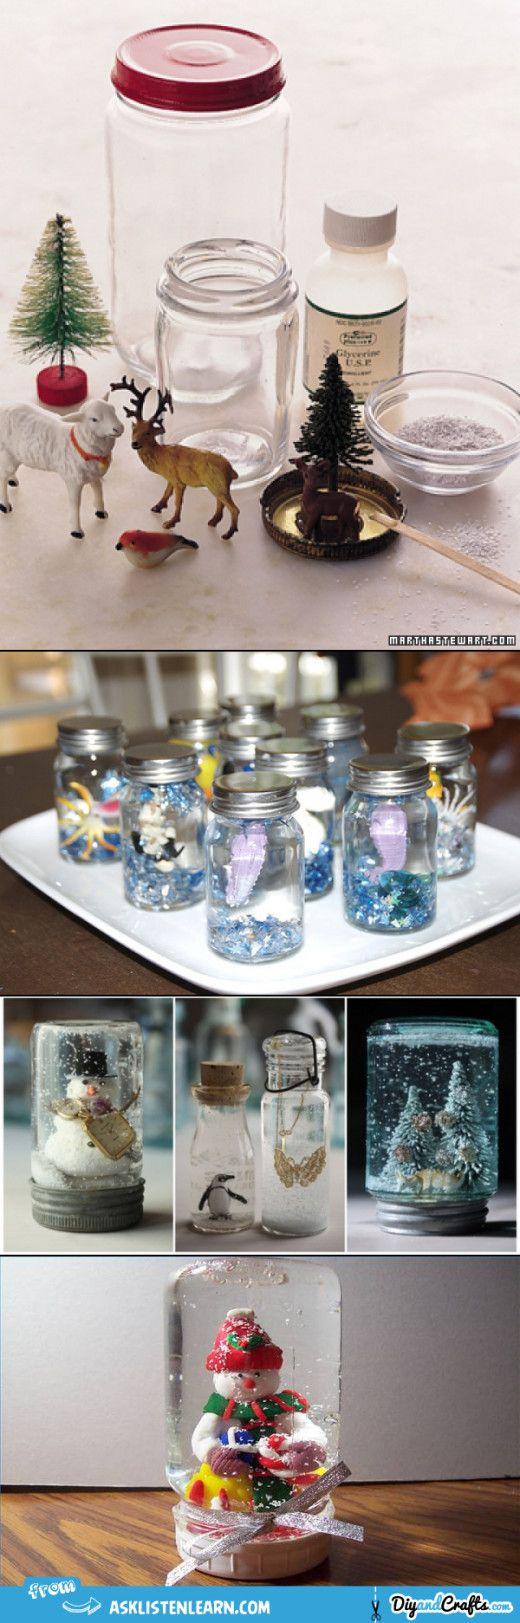 Make your own snow globe | #DIY